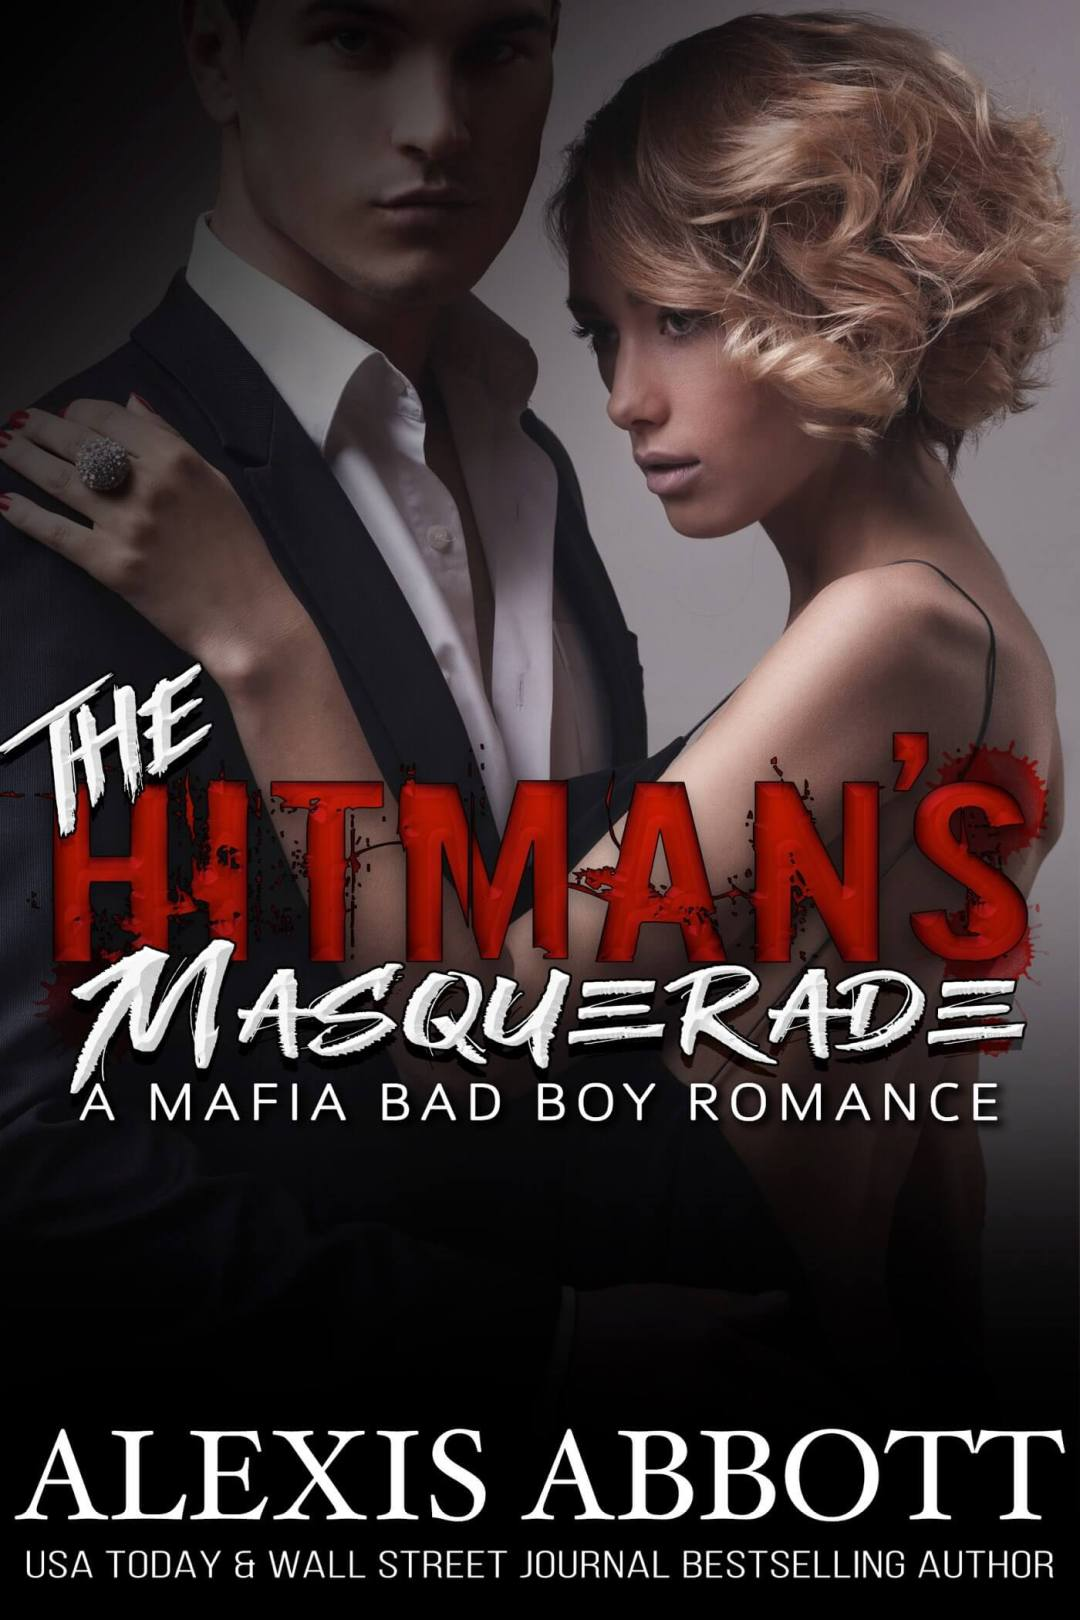 Alexis Abbott - The Hitman's Masquerade